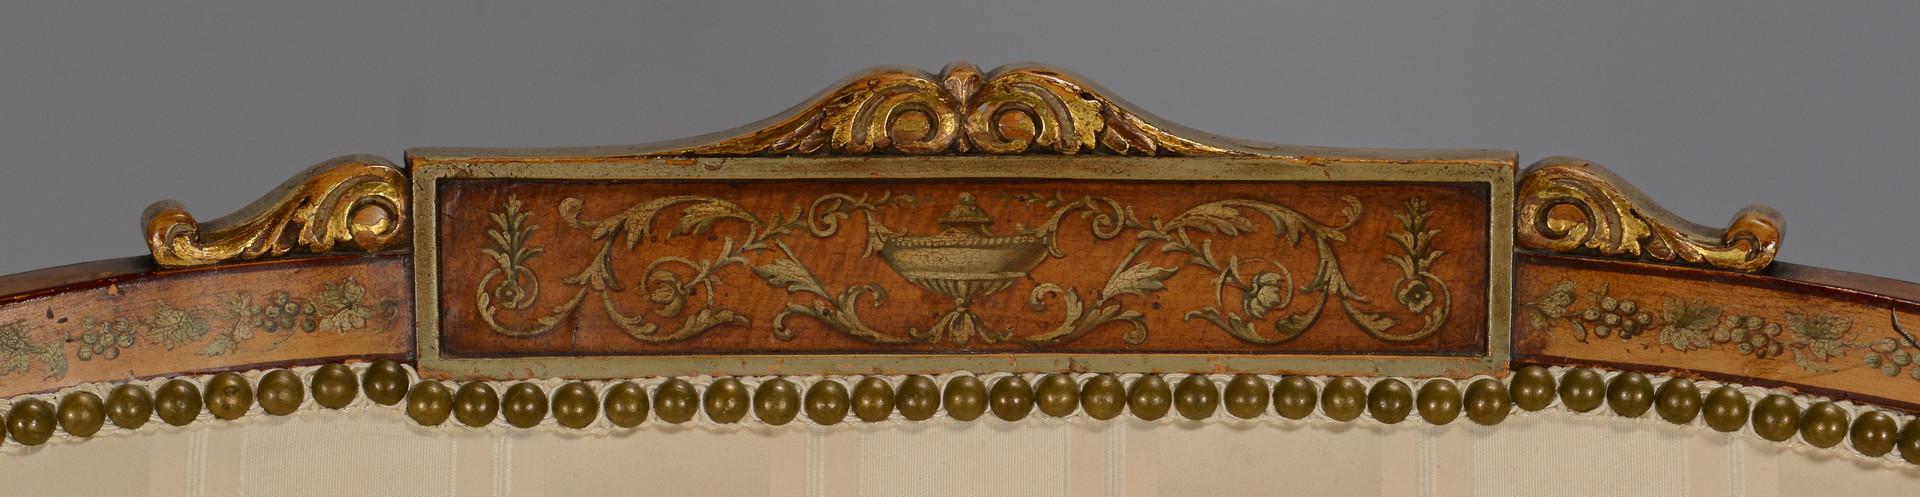 Lot 311: Louis XVI Style Settee